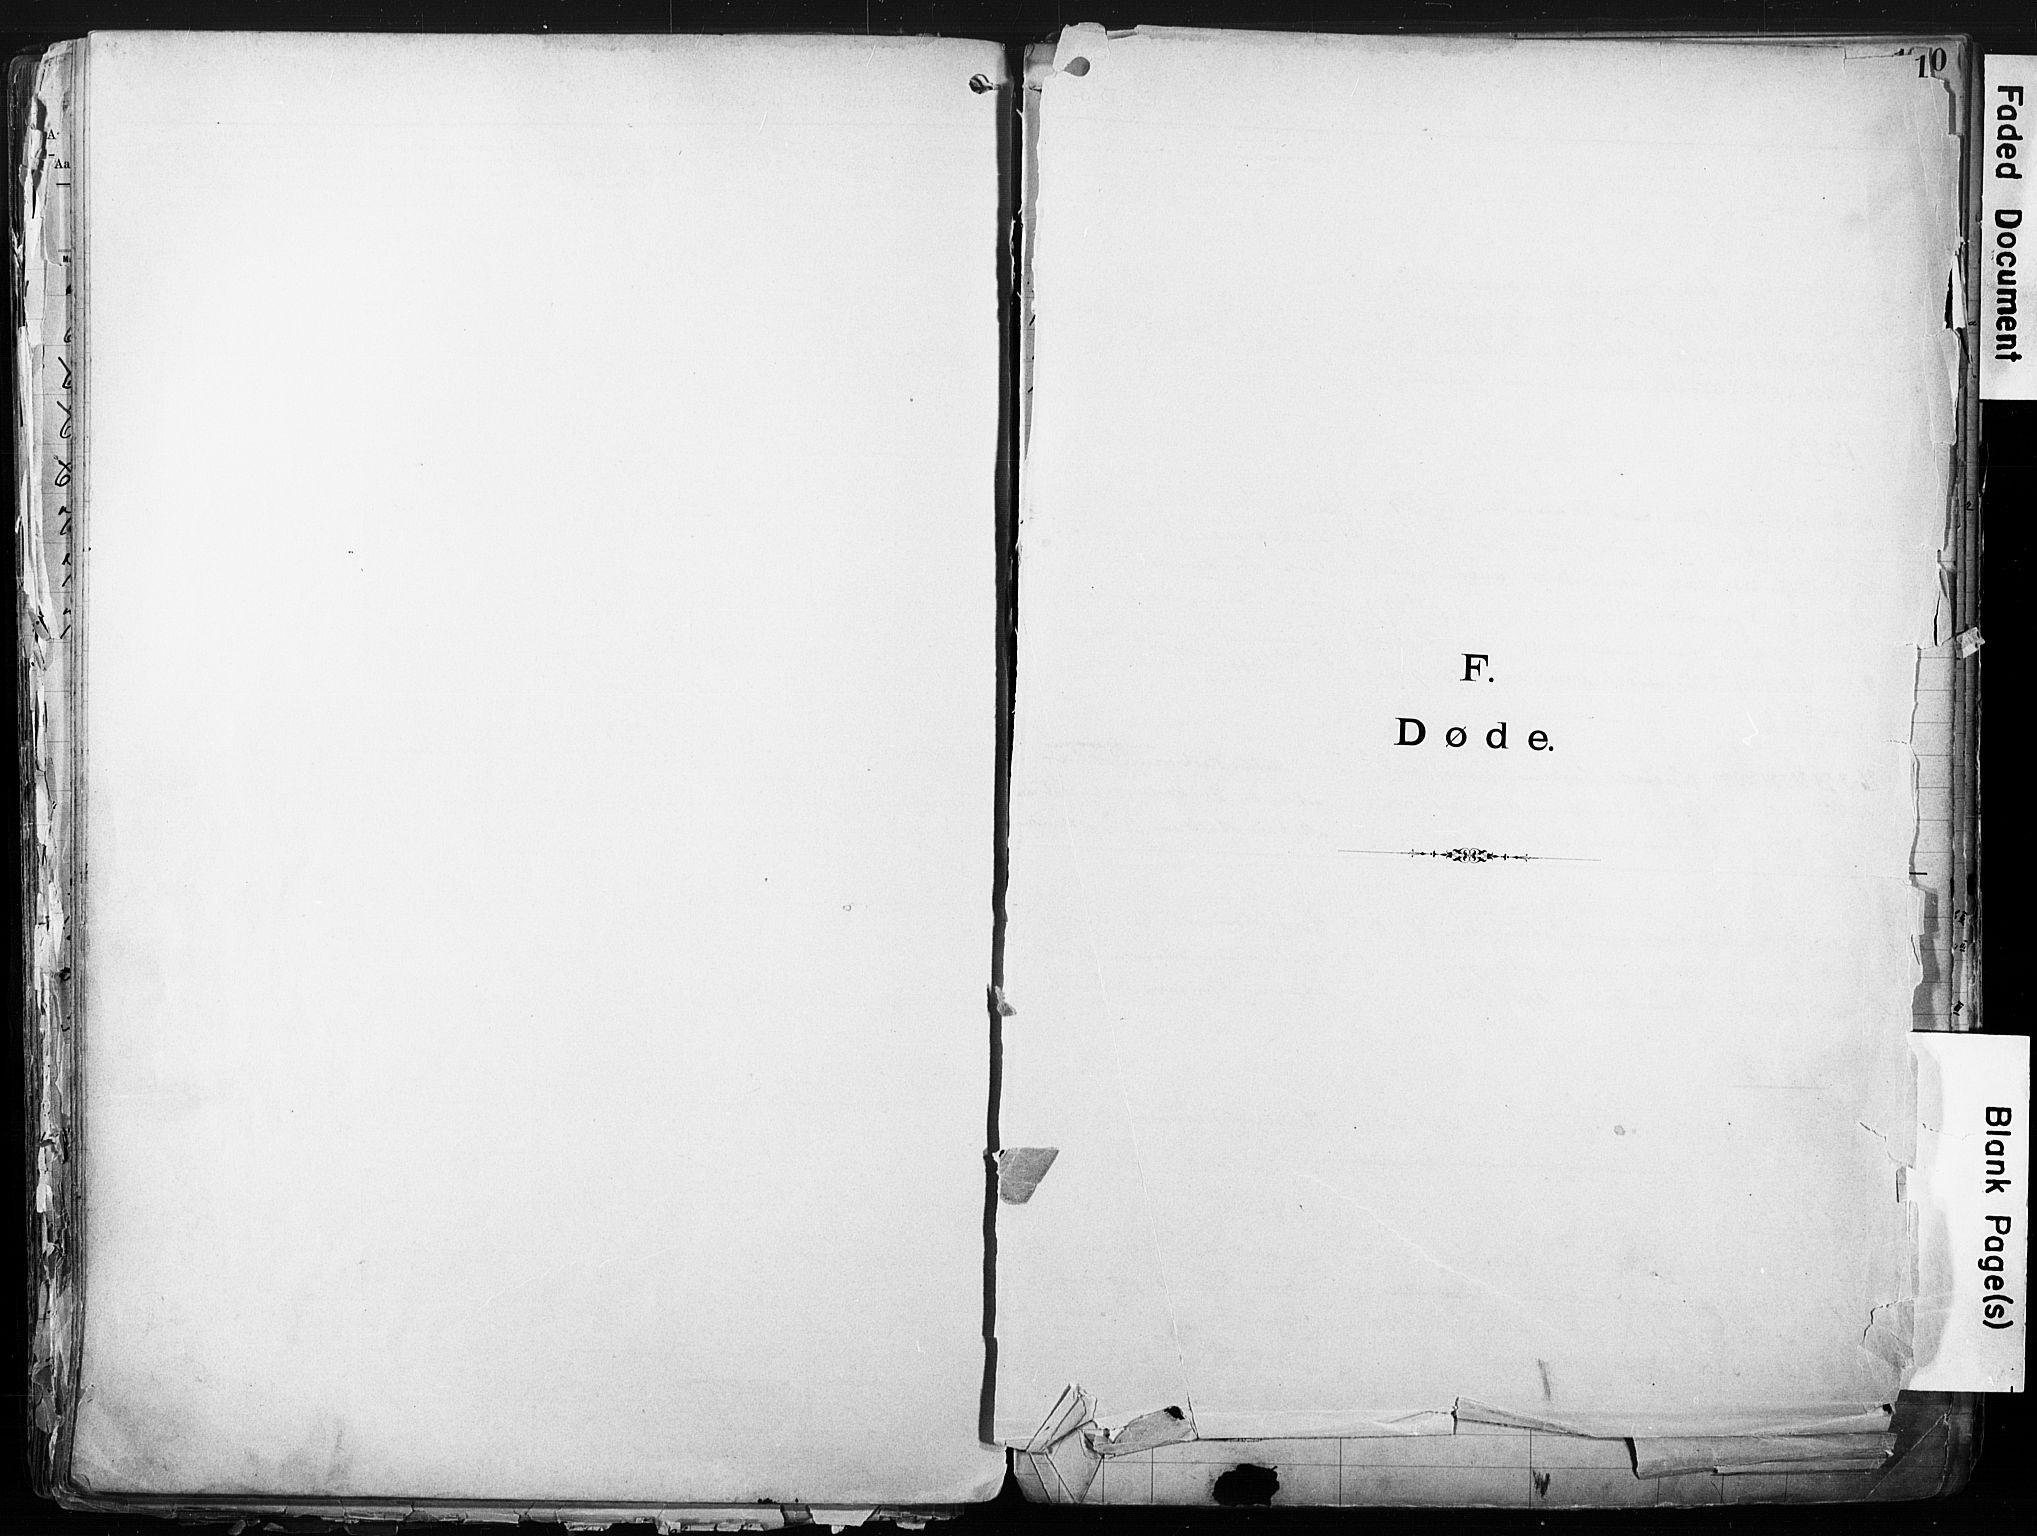 SAO, Sarpsborg metodistkirke, A/L0004: Dissenterprotokoll nr. 4, 1892-1923, s. 159